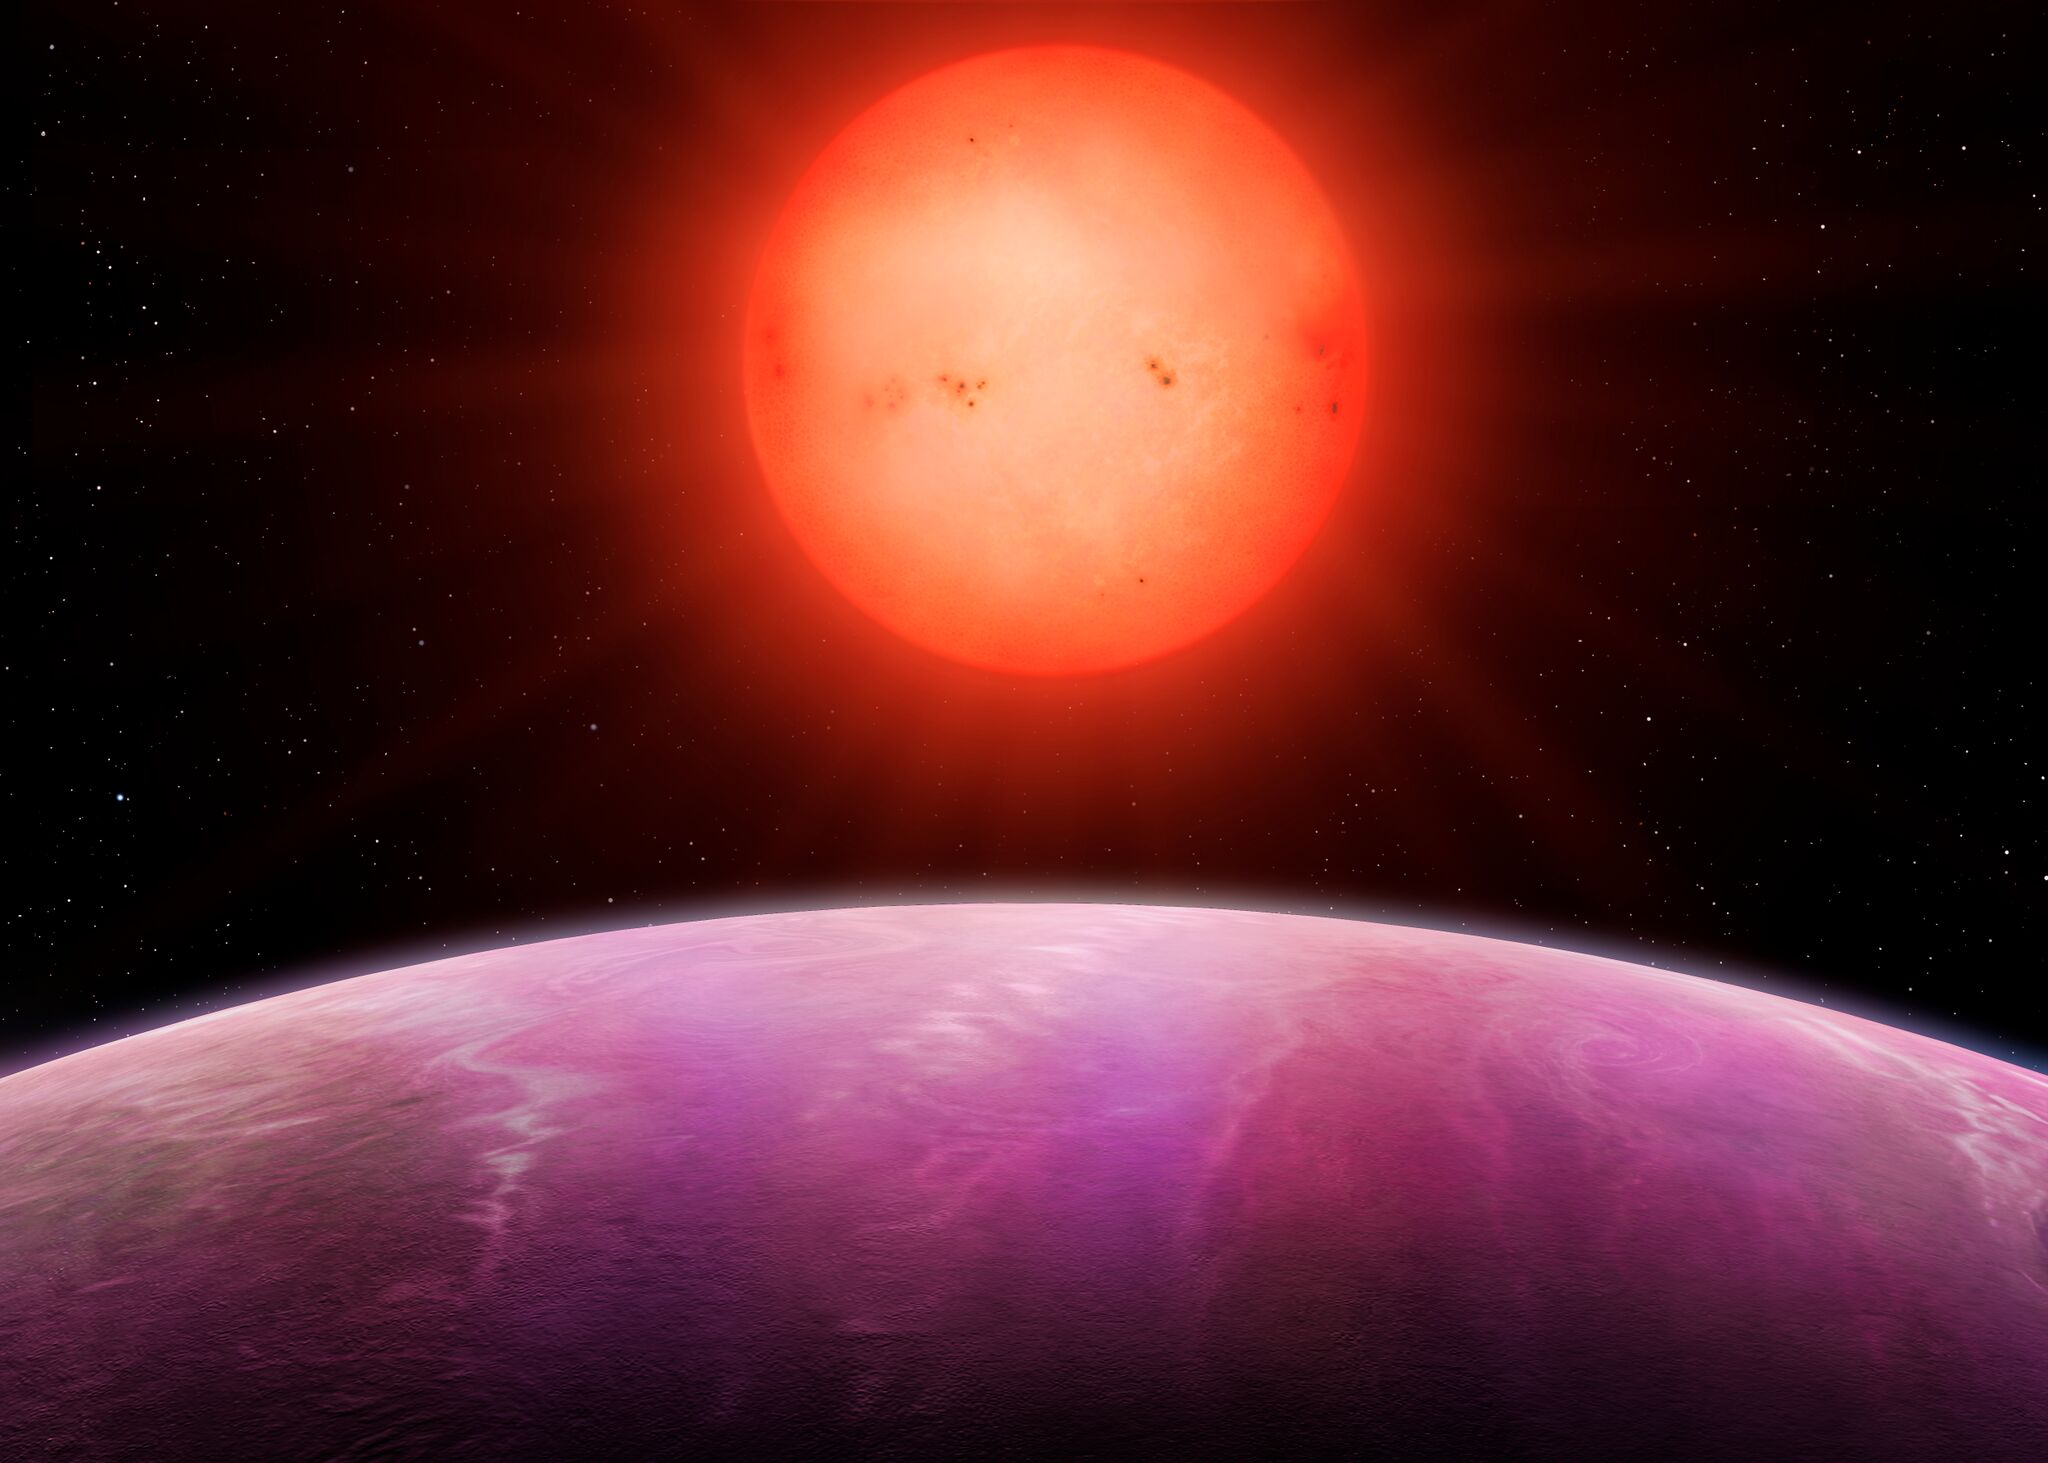 https://warwick.ac.uk/services/communications/medialibrary/images/october2017/exoplanet_ngts-1b_-_credit_university_of_warwick__mark_garlick.jpg